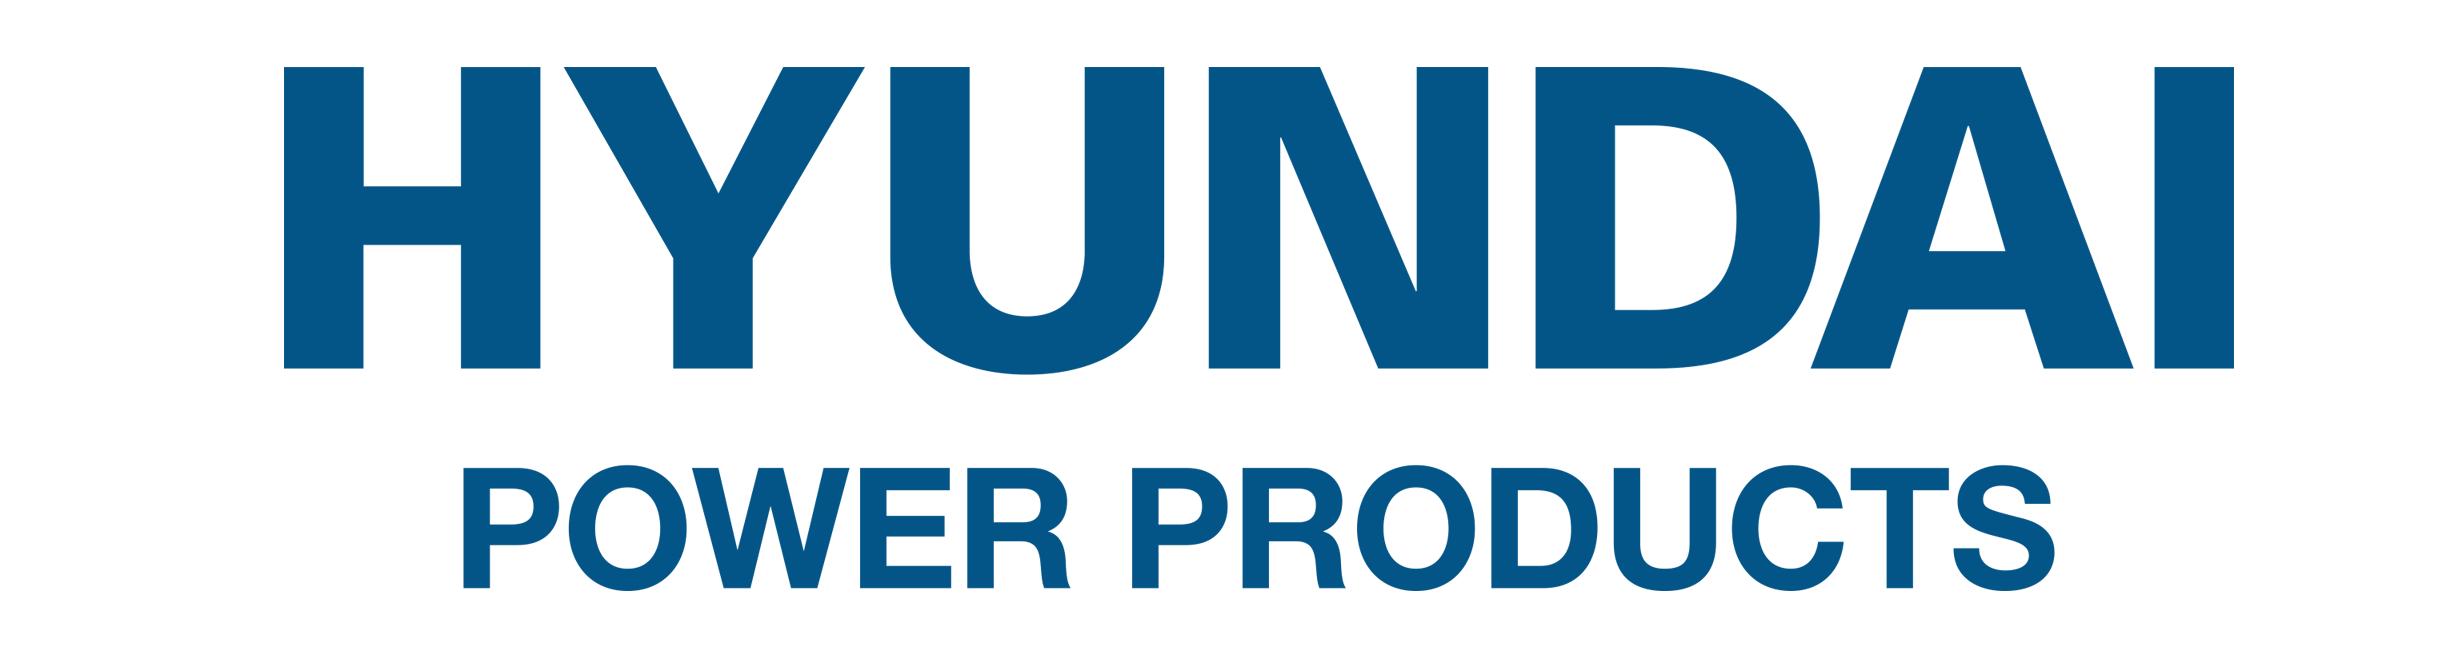 Hyundai-Power-Products